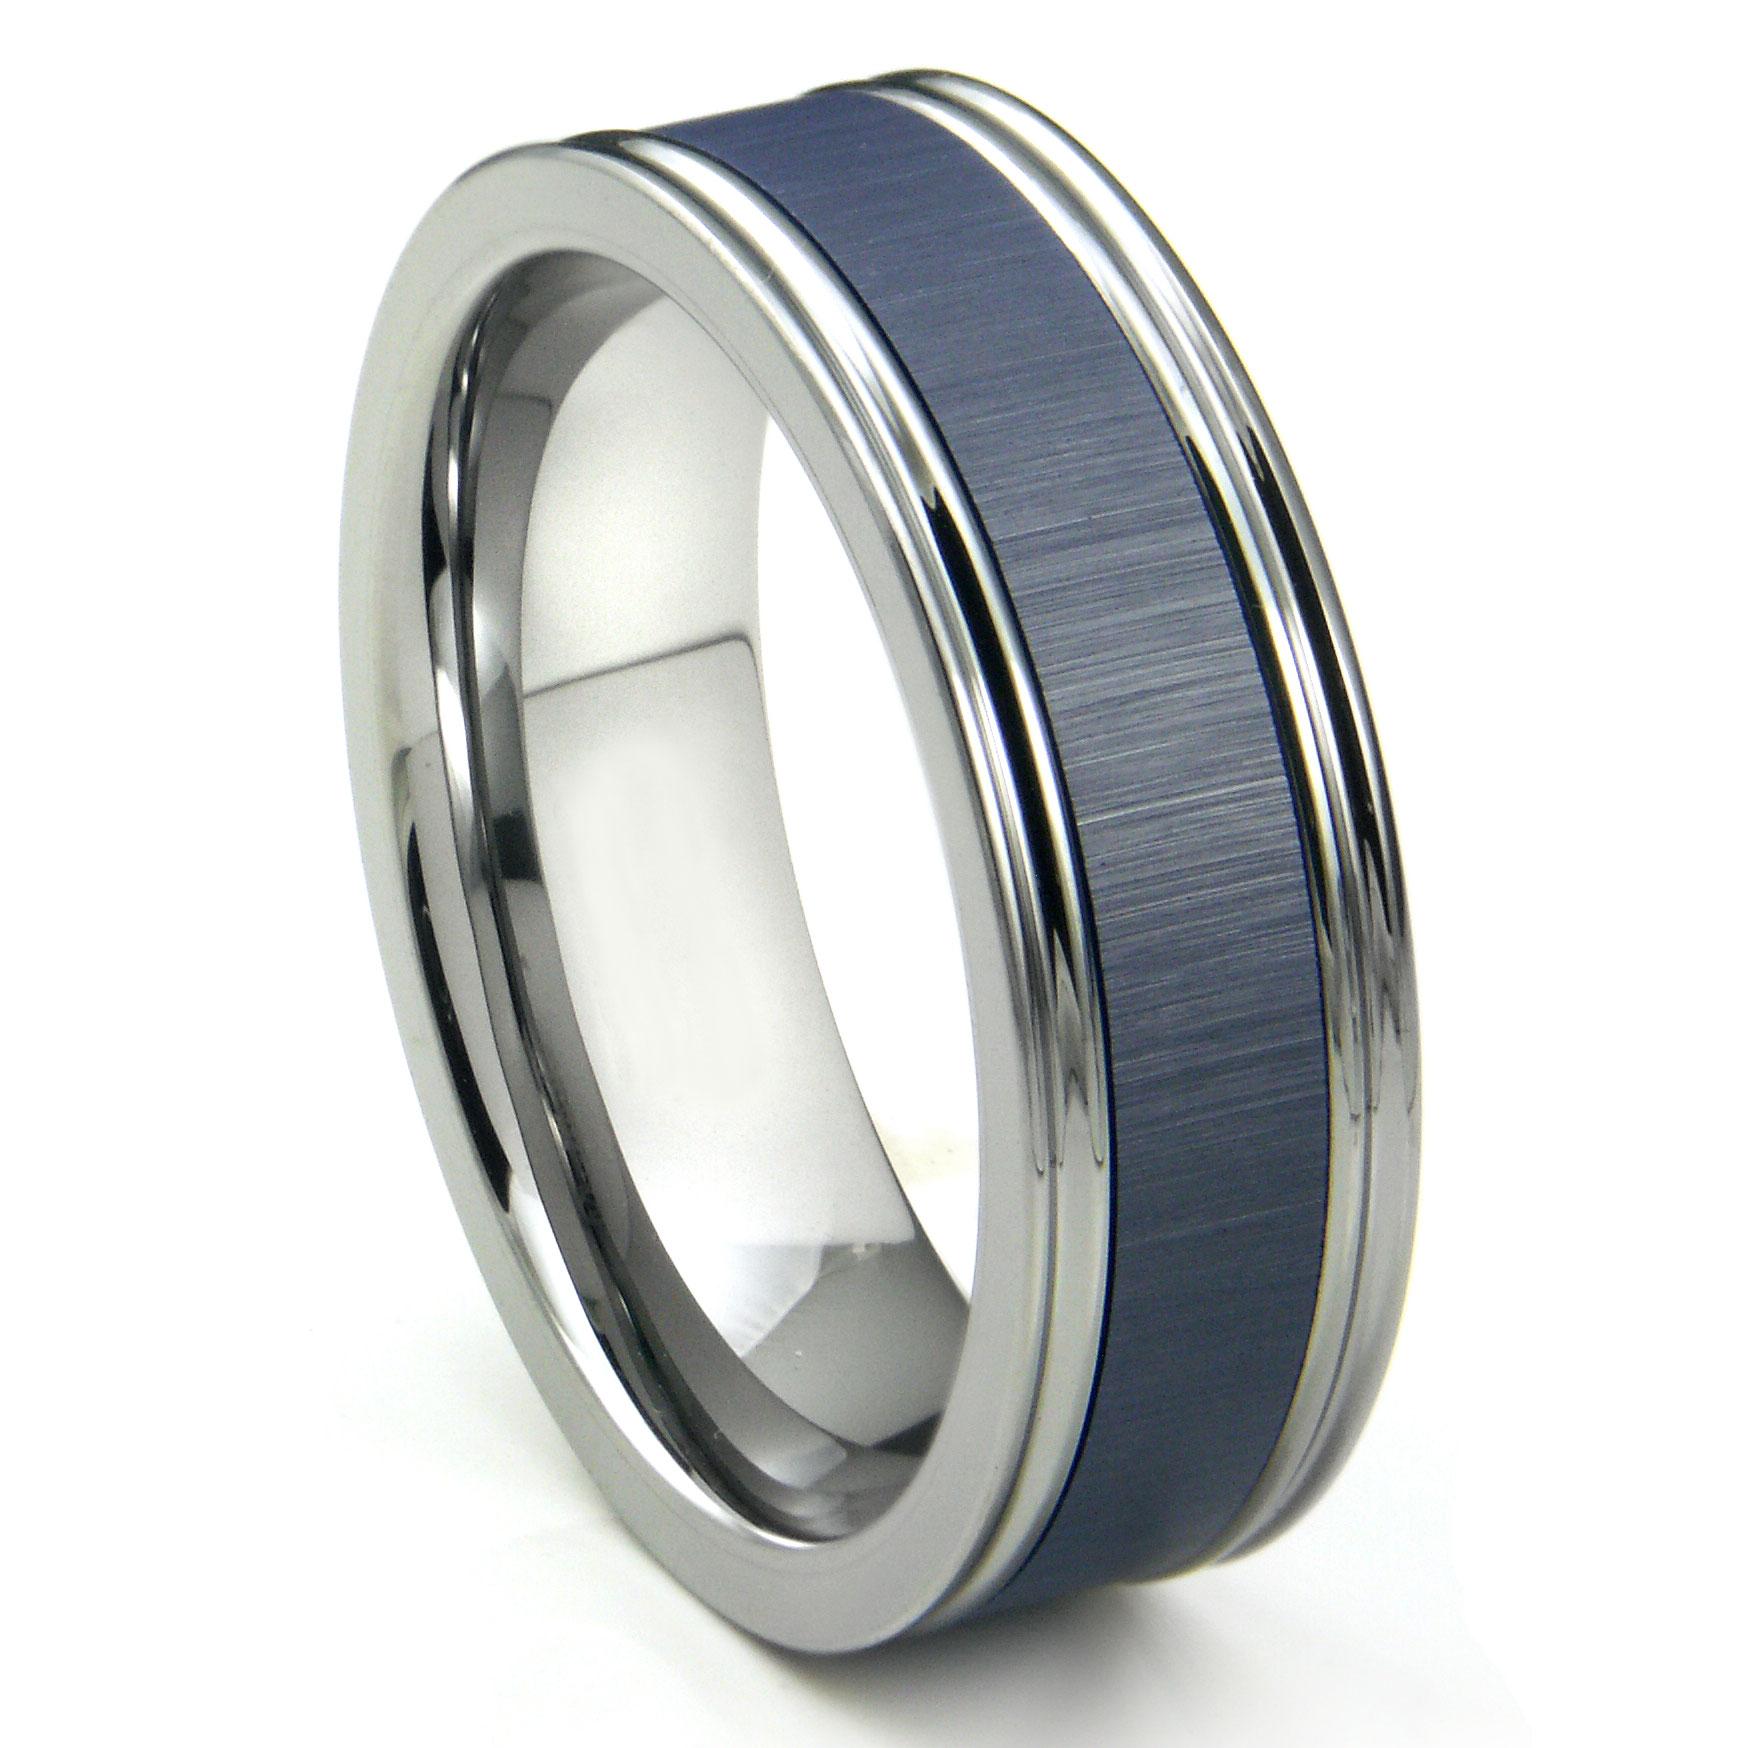 Tungsten Carbide Blue Ceramic Inlay Wedding Band Ring w Horizontal Satin Finish P blue wedding rings Loading zoom